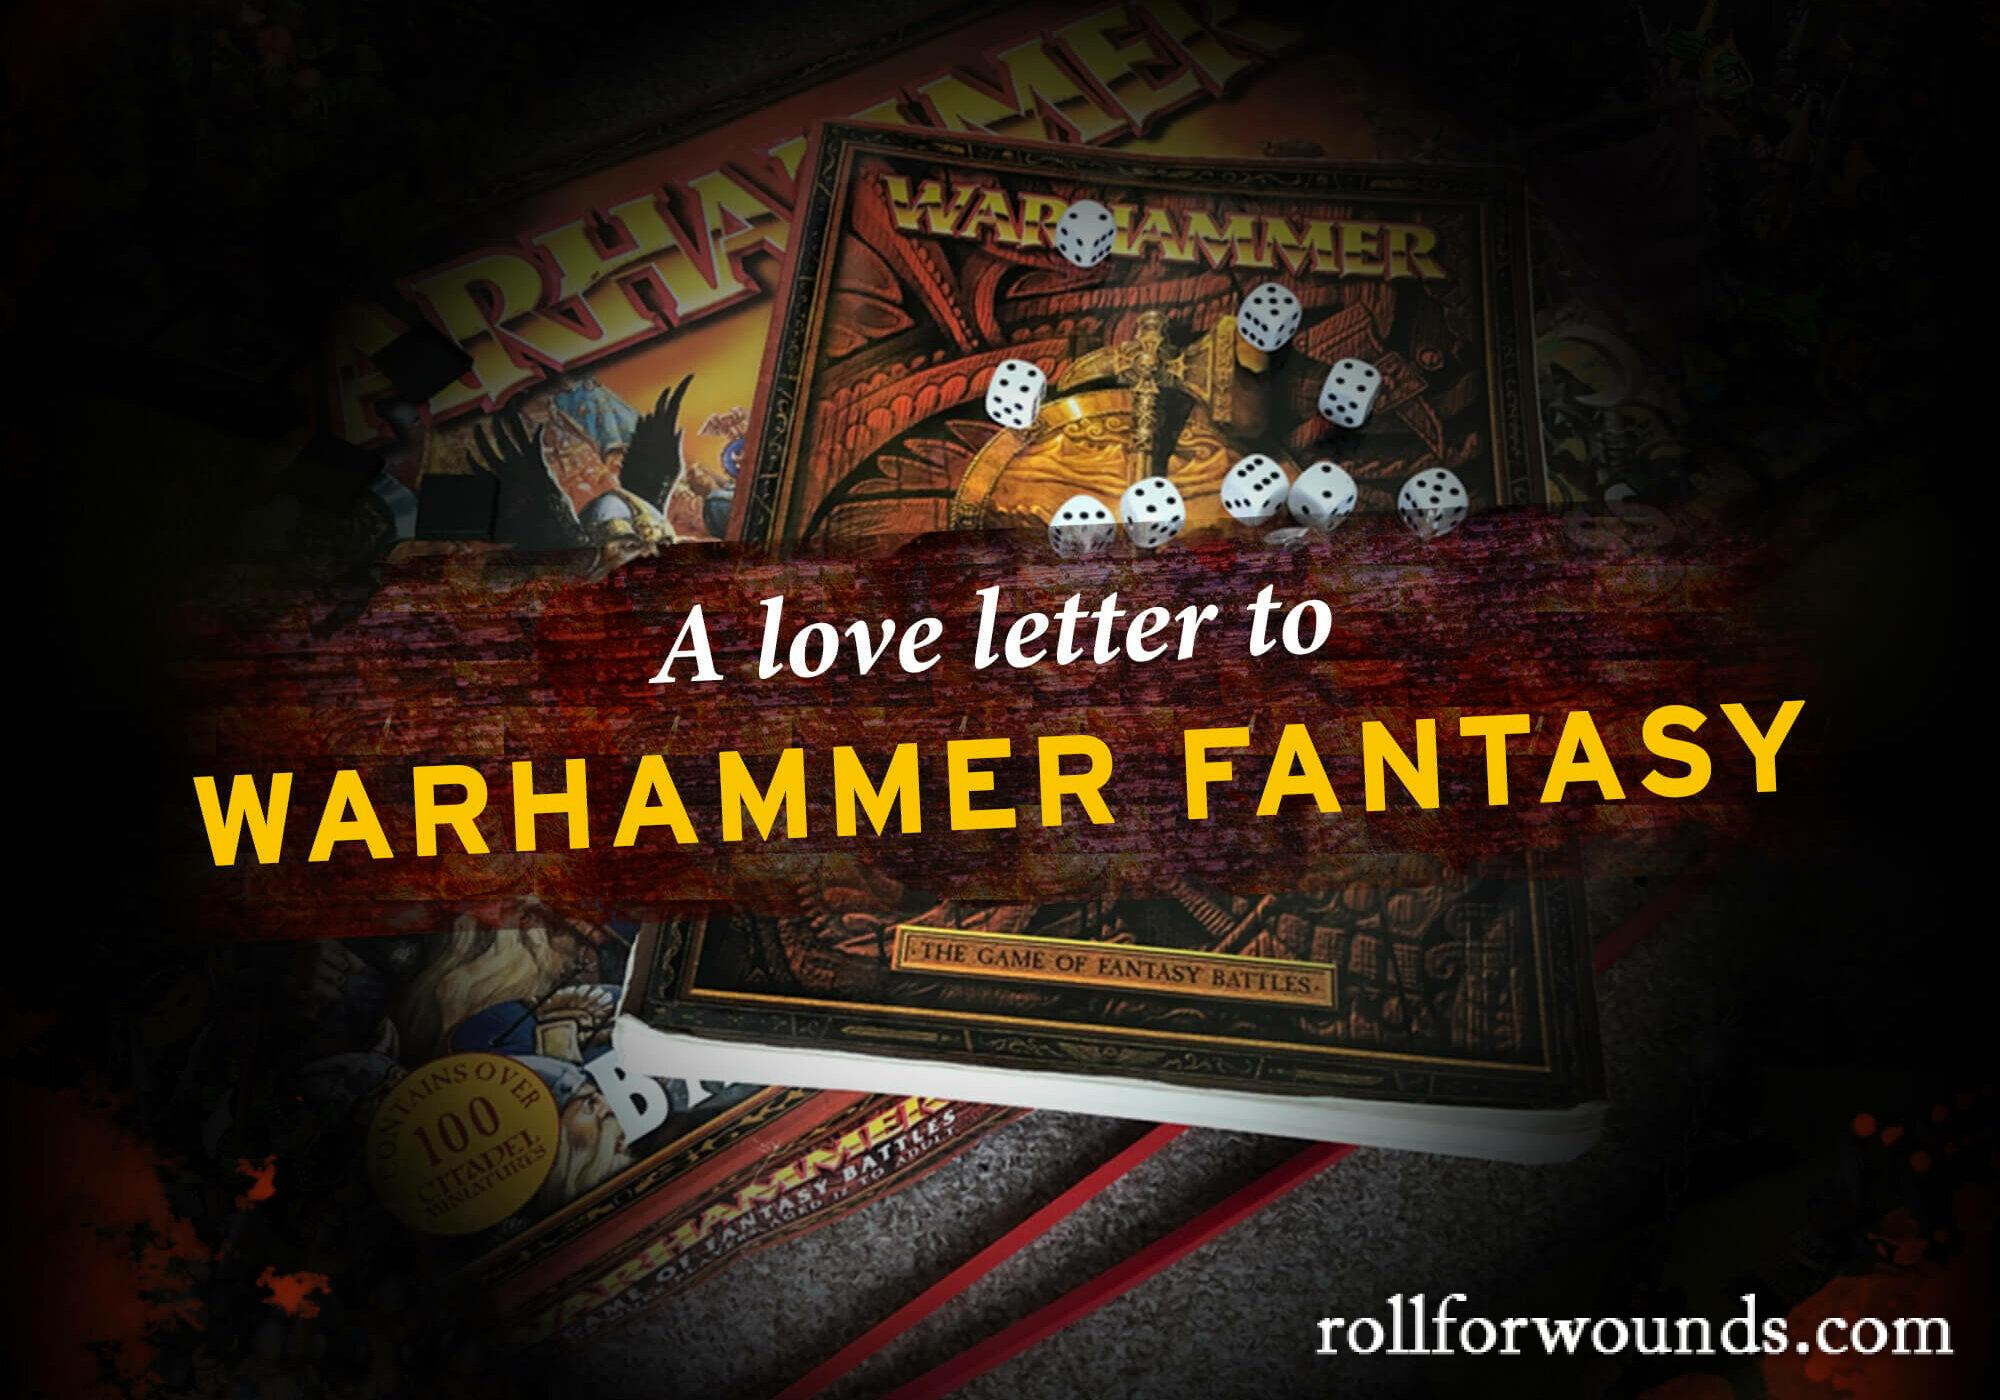 Warhammer Fantasy Battles (6th and 7th Edition)